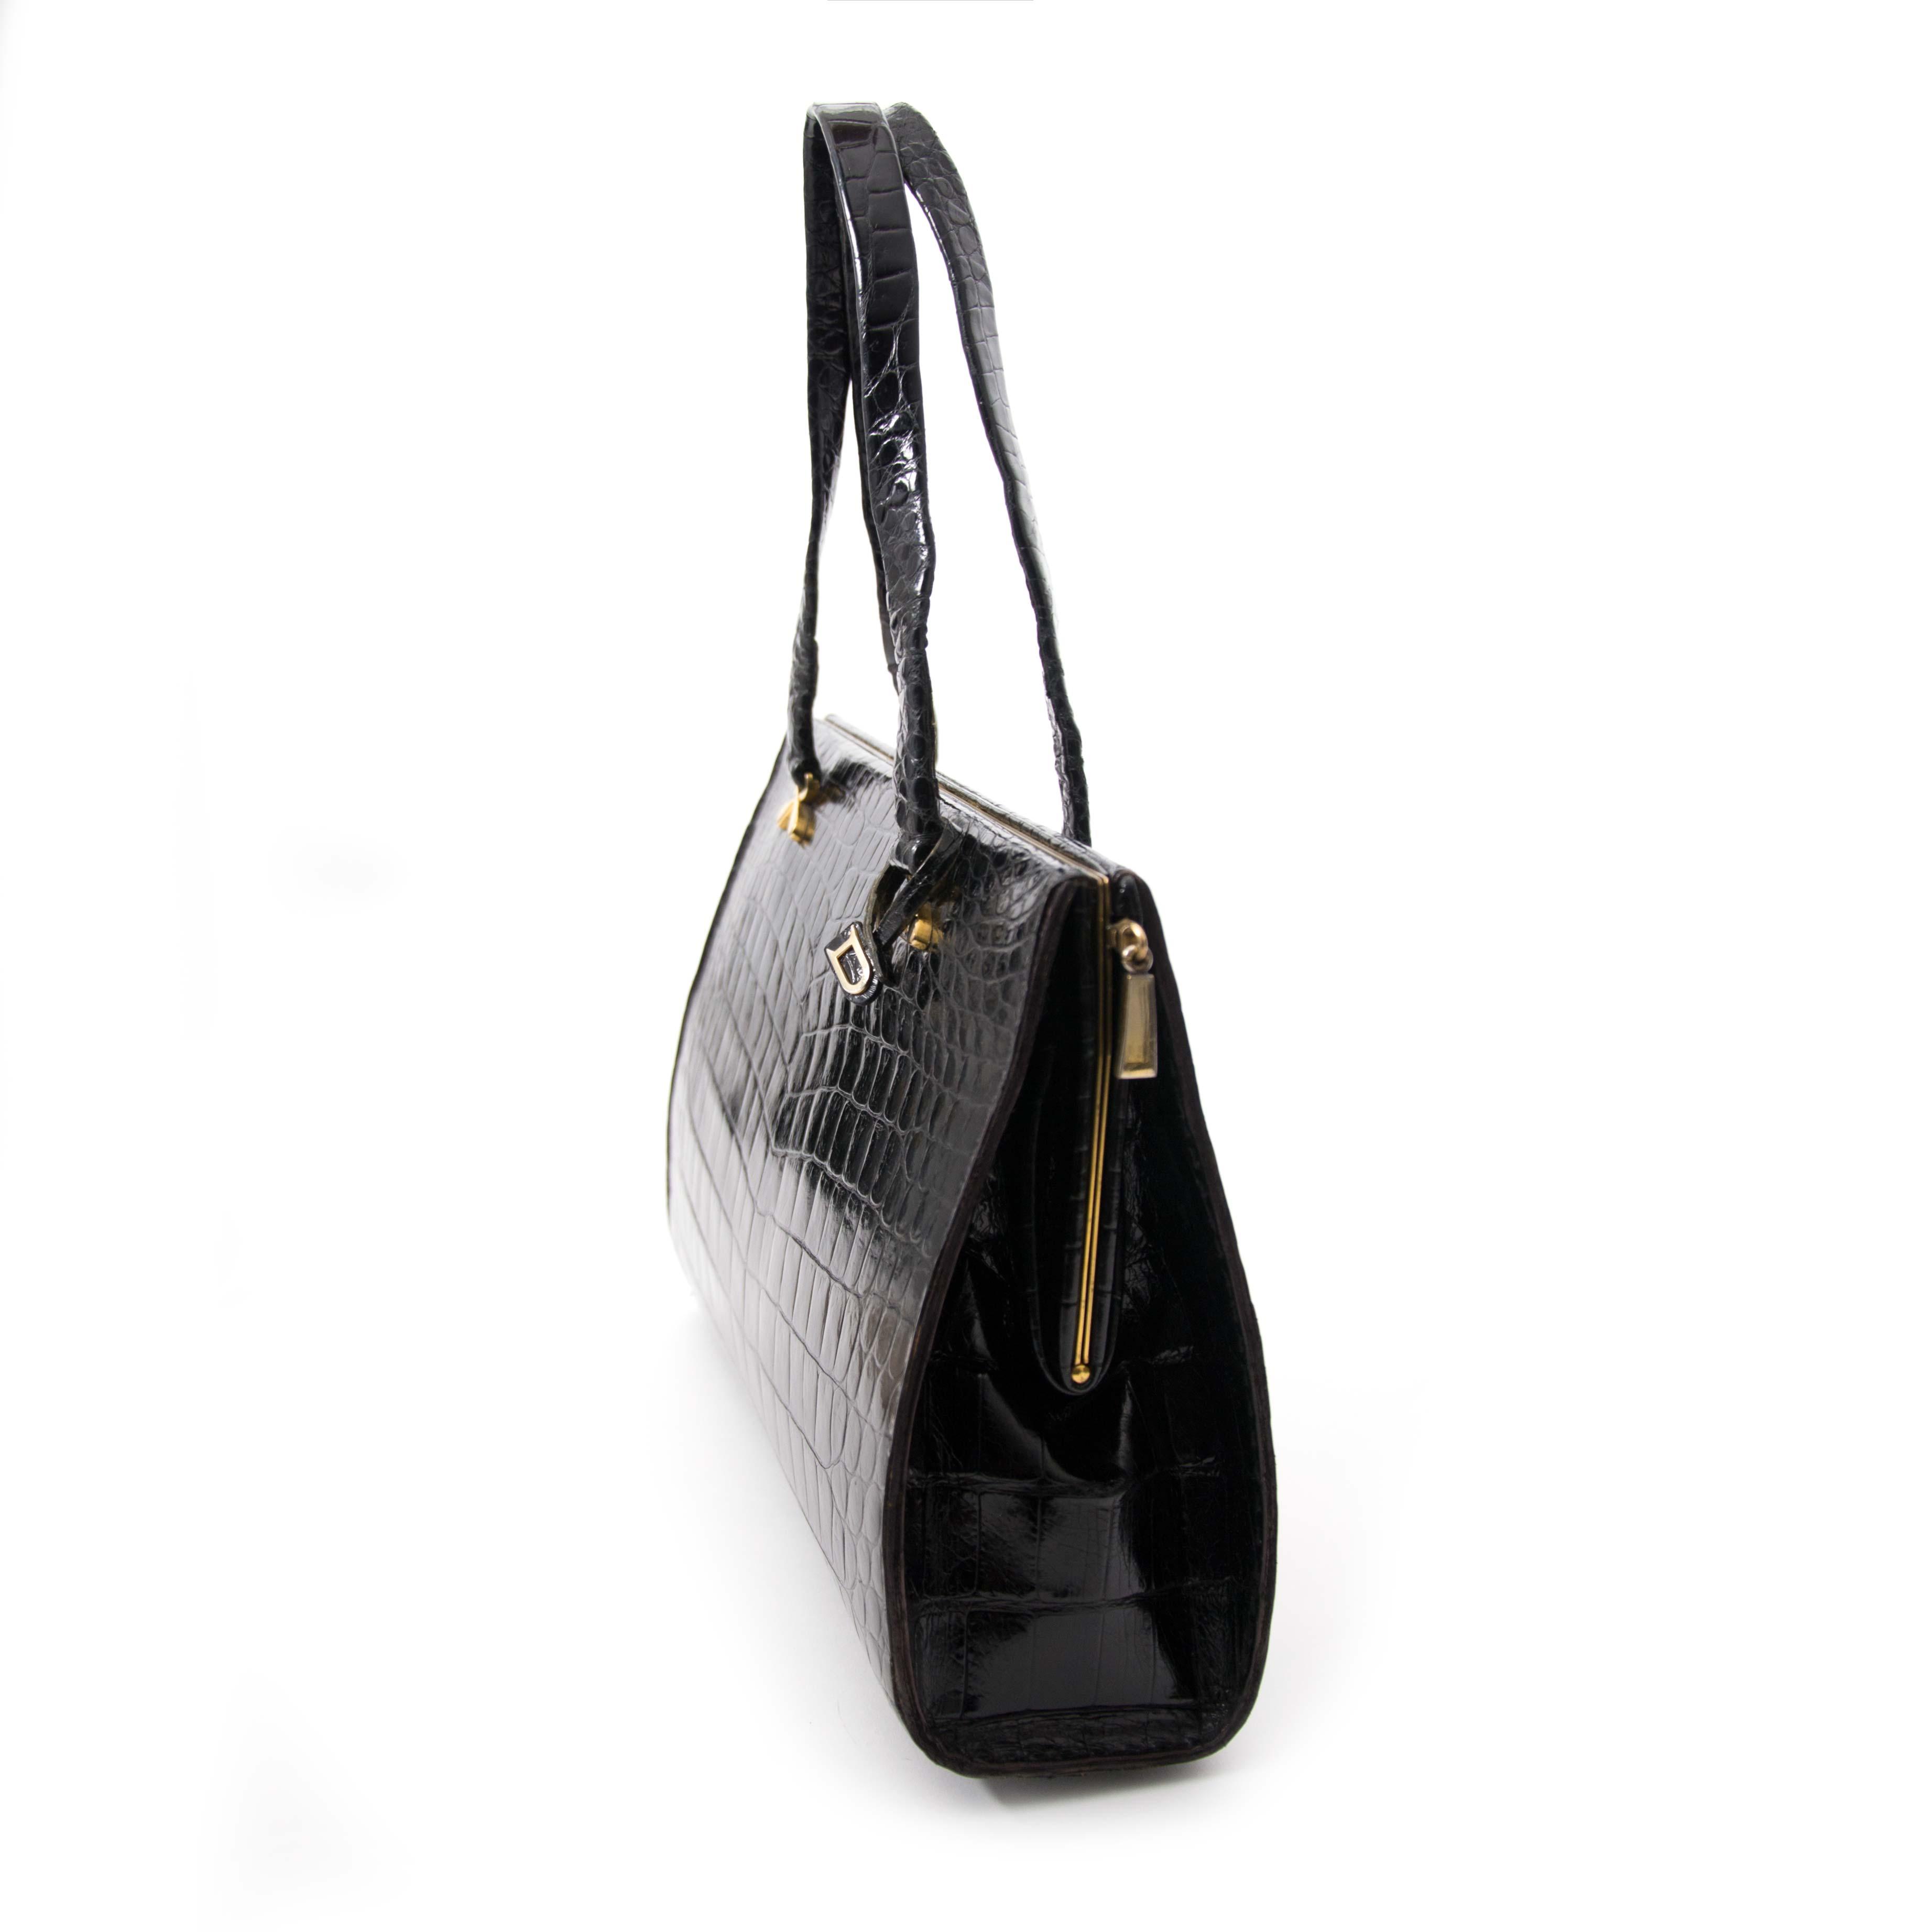 shop safe online your secondhand Delvaux Croco Black Evening Bag